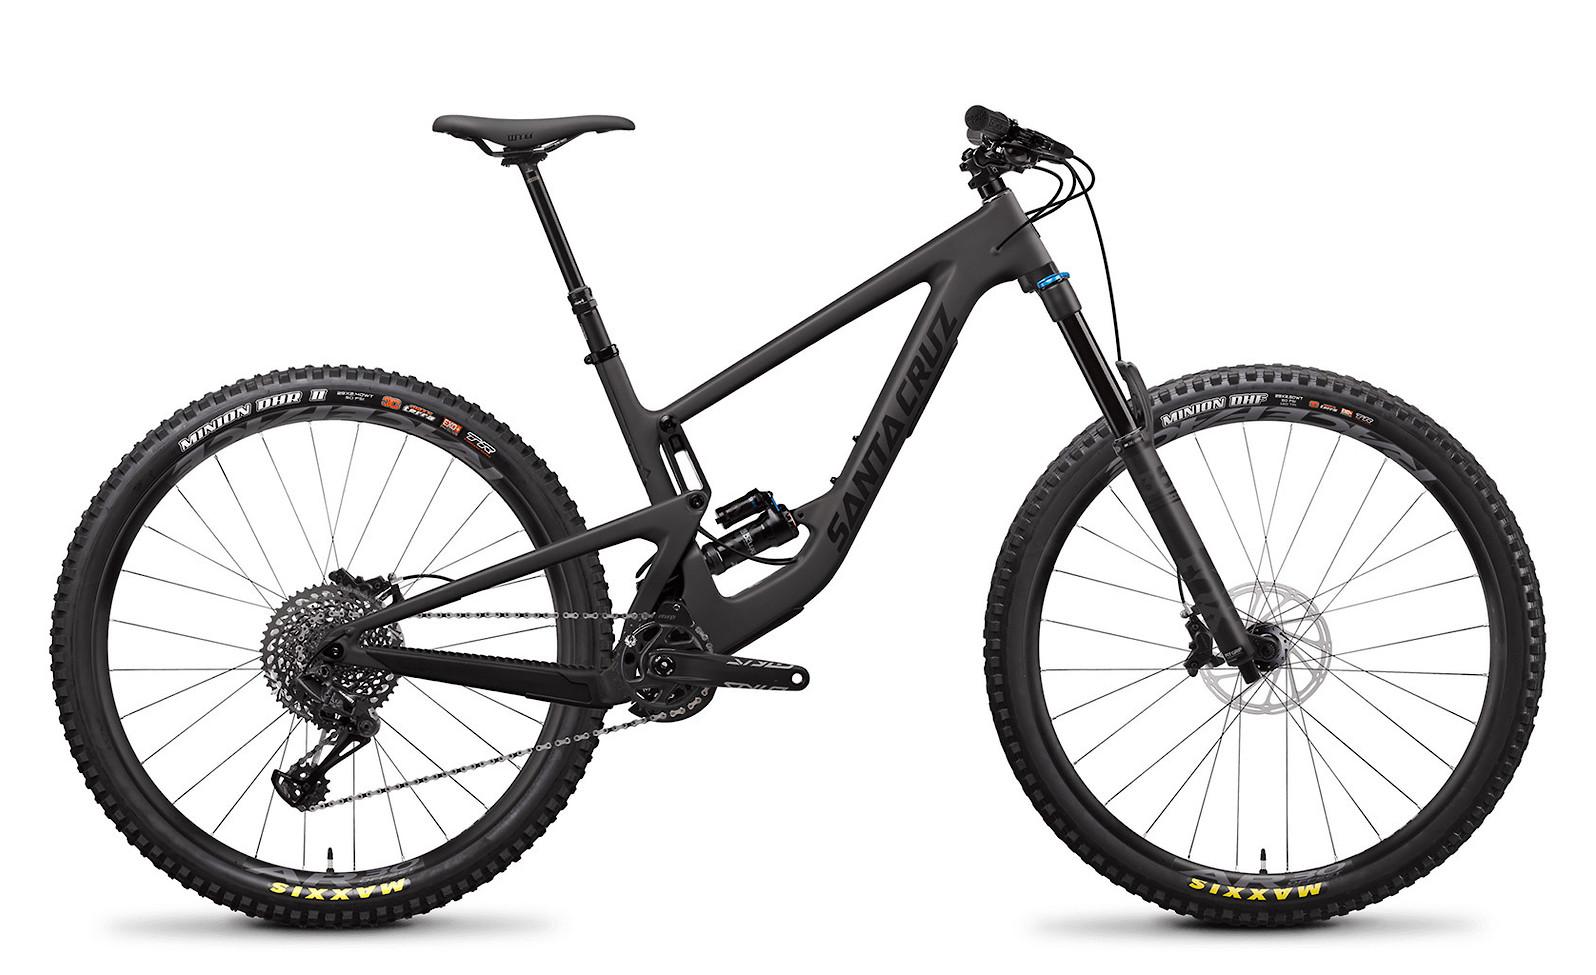 2019 Santa Cruz Megatower C S 29 Bike - Reviews, Comparisons